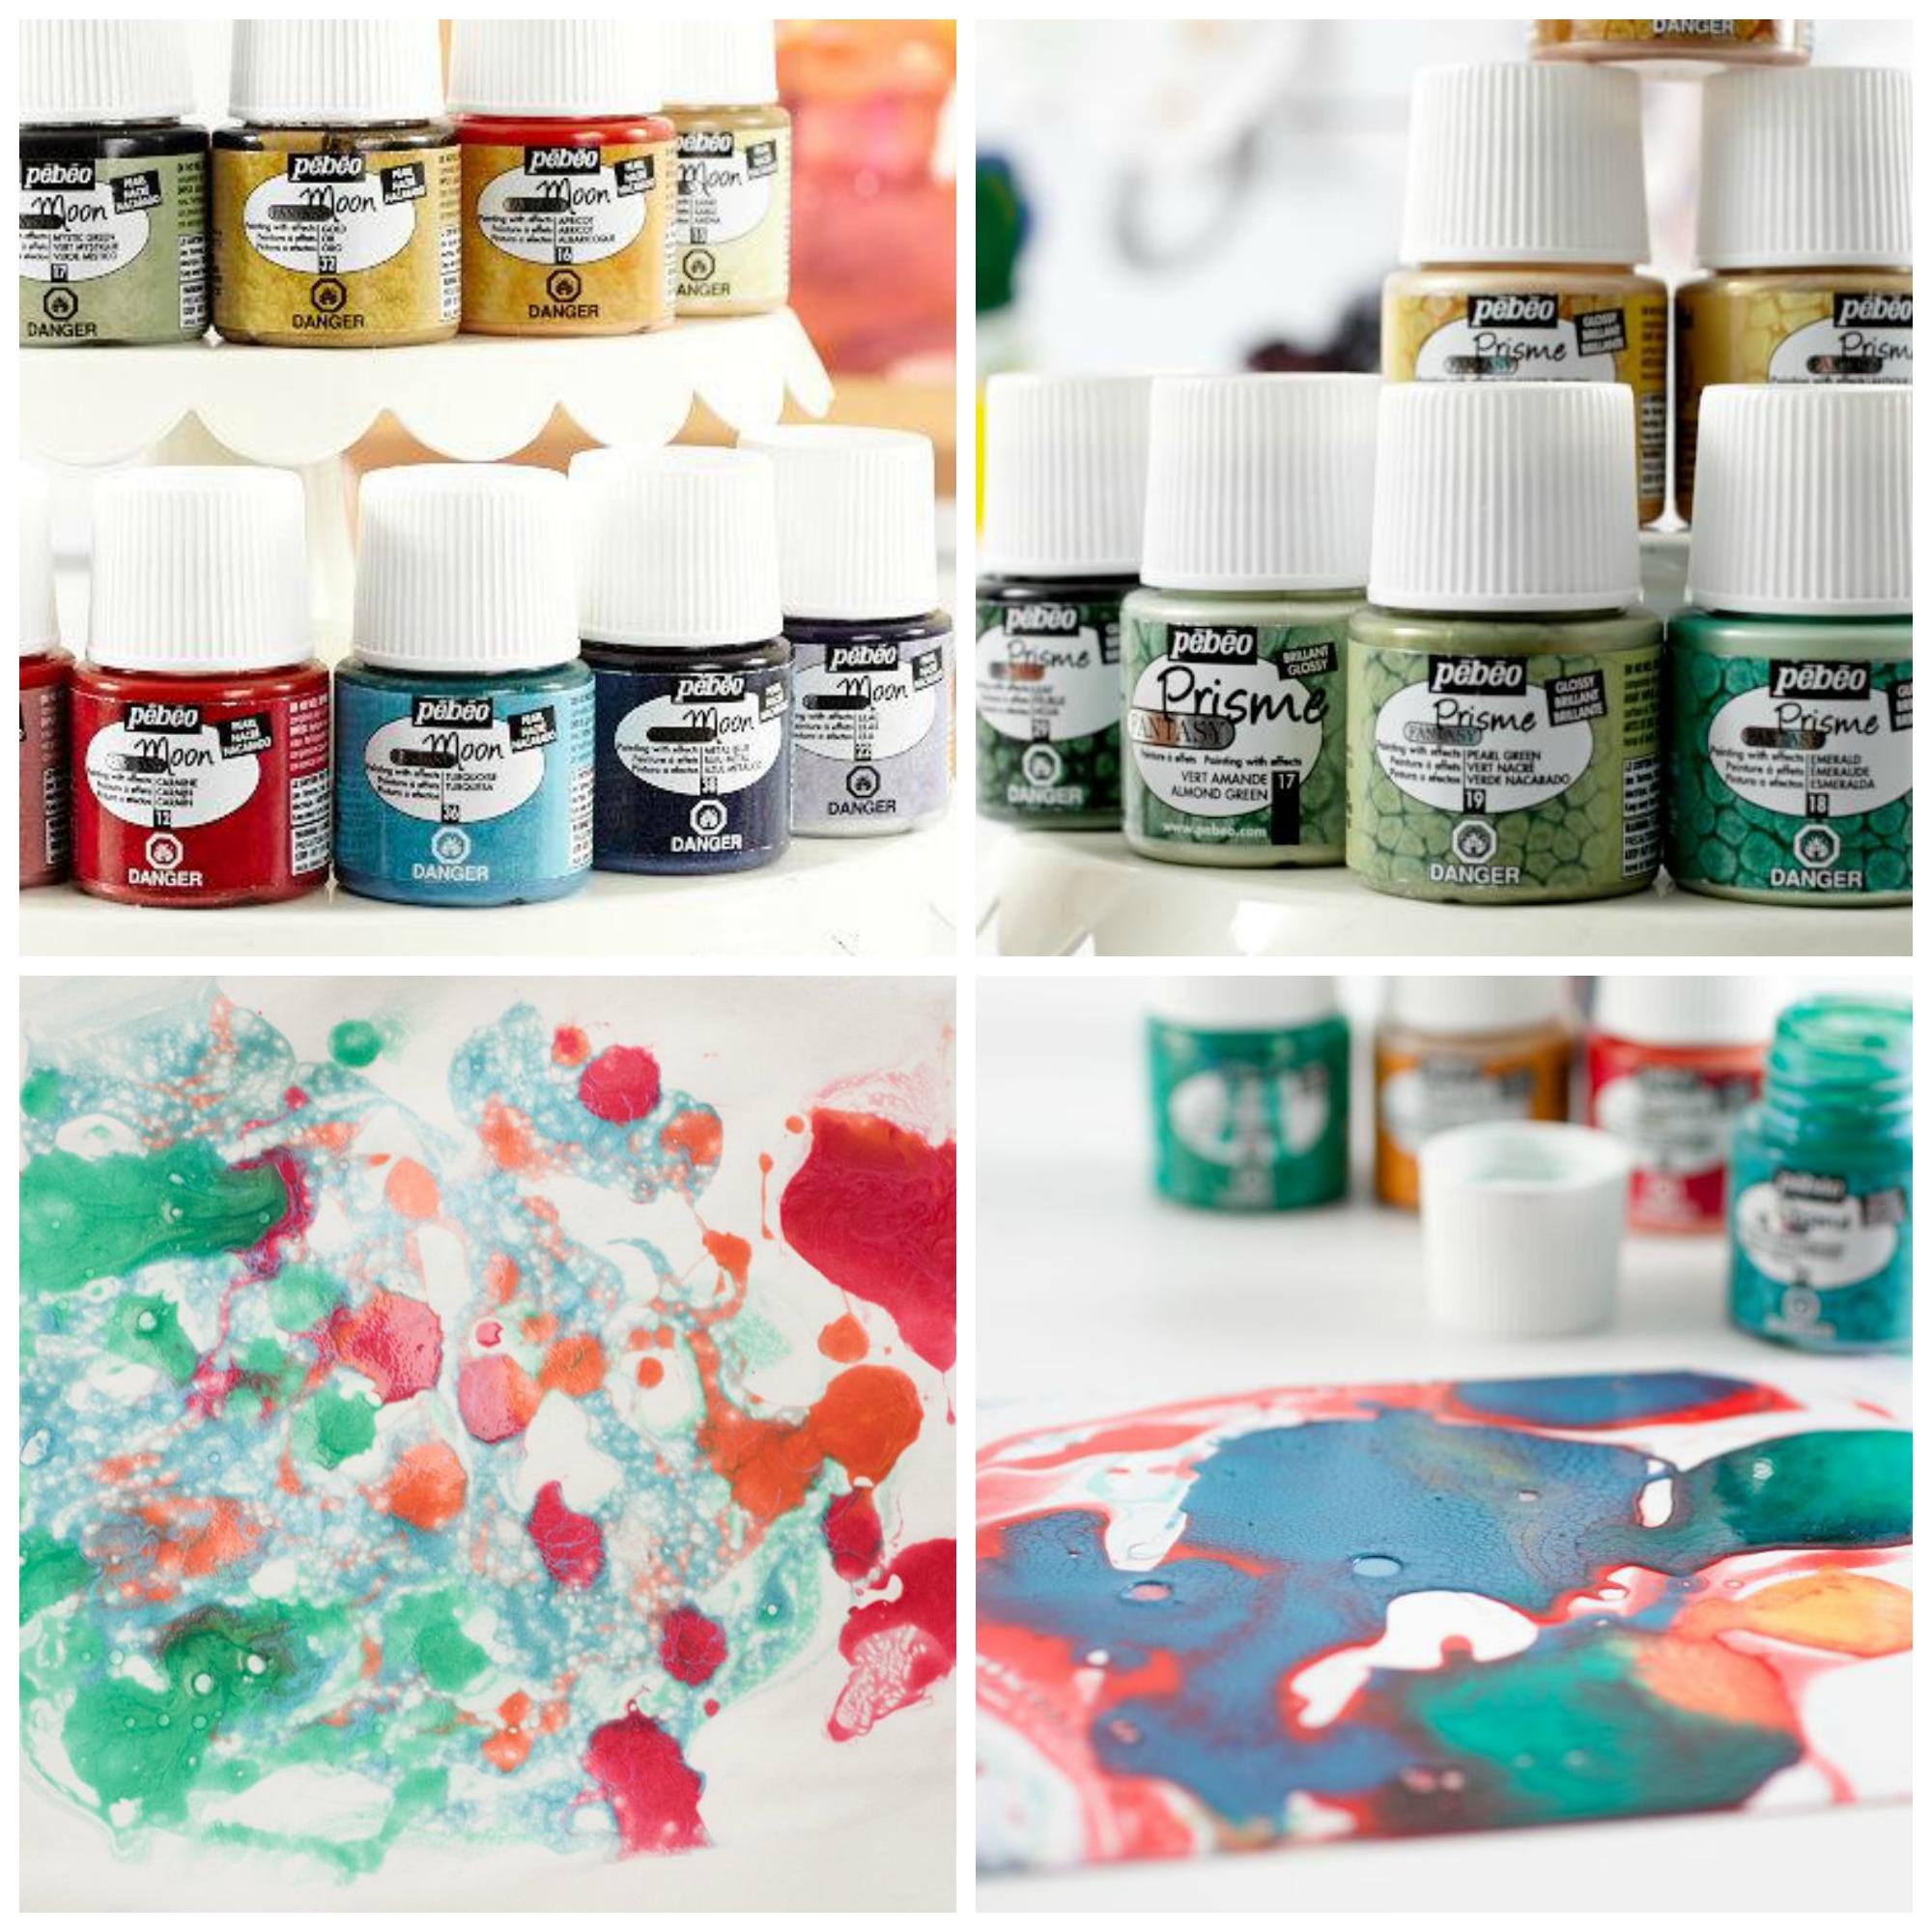 Pebeo Paints Collage